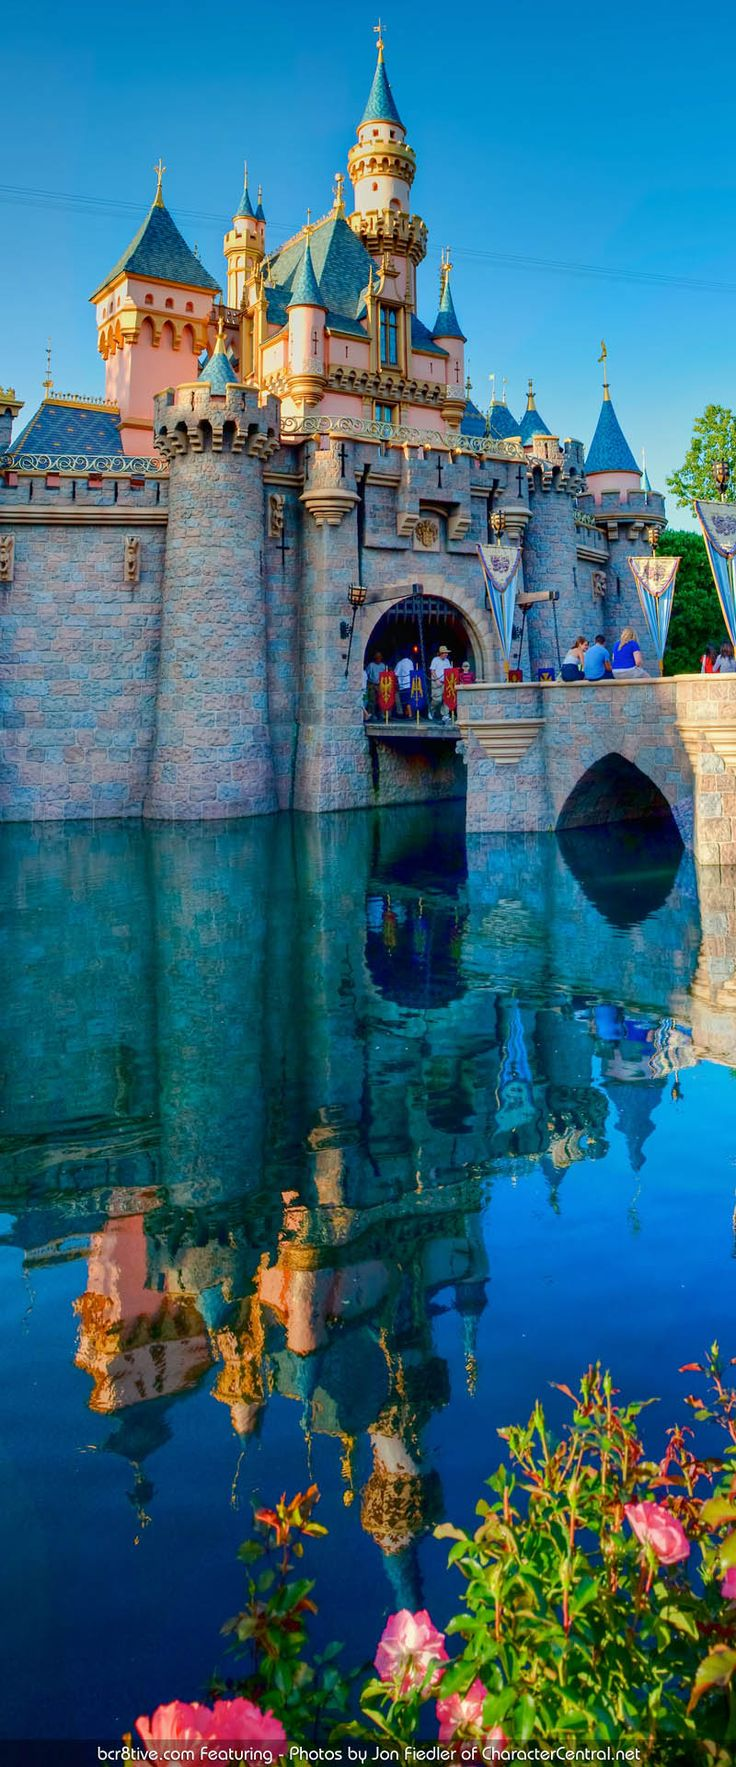 I'll Never Be Too Old for Disney - Disneyland Park, Disneyland Resort, Anaheim, CA